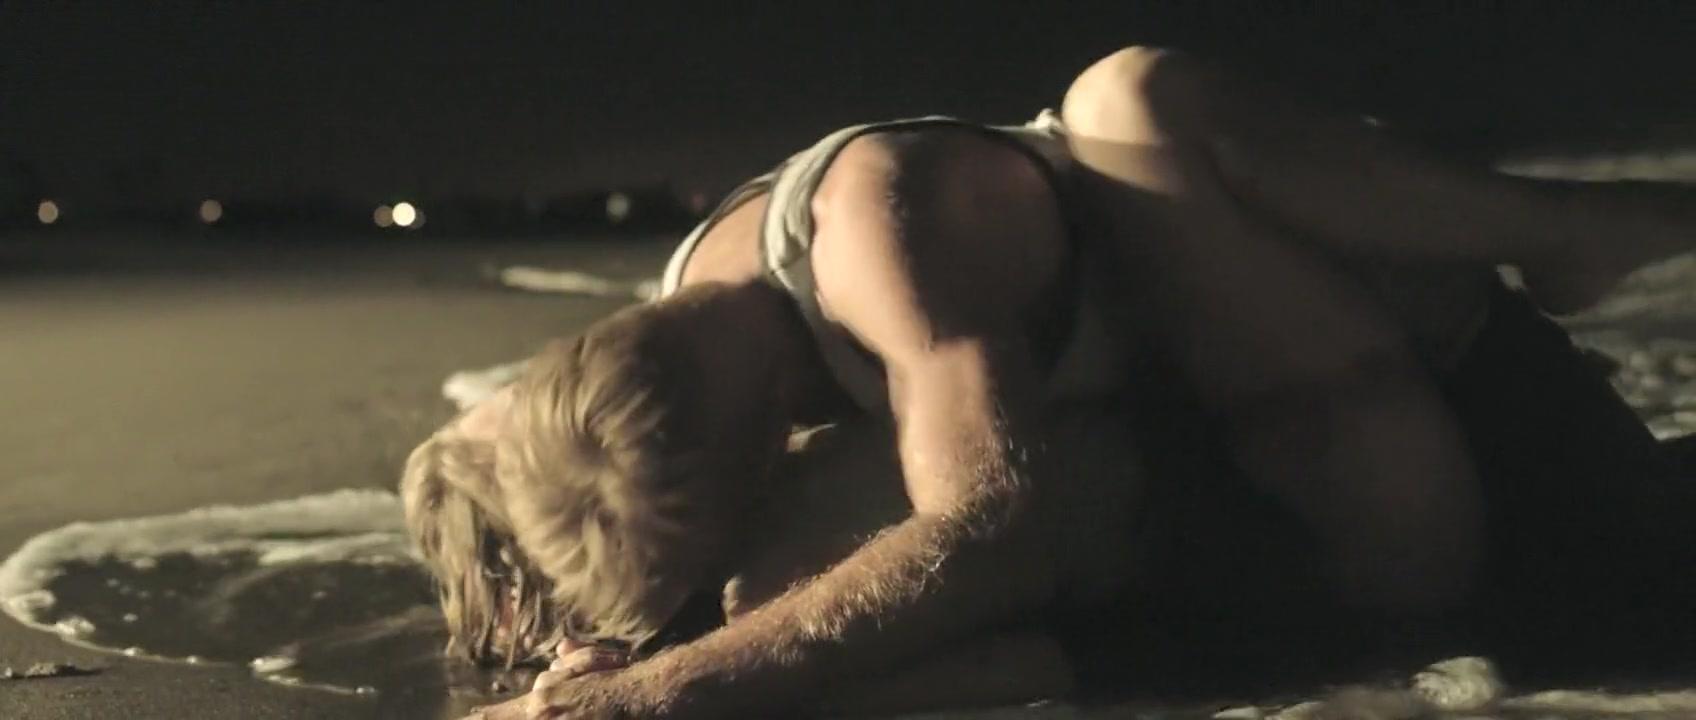 Hot xXx Video Old and milf lesbian pics